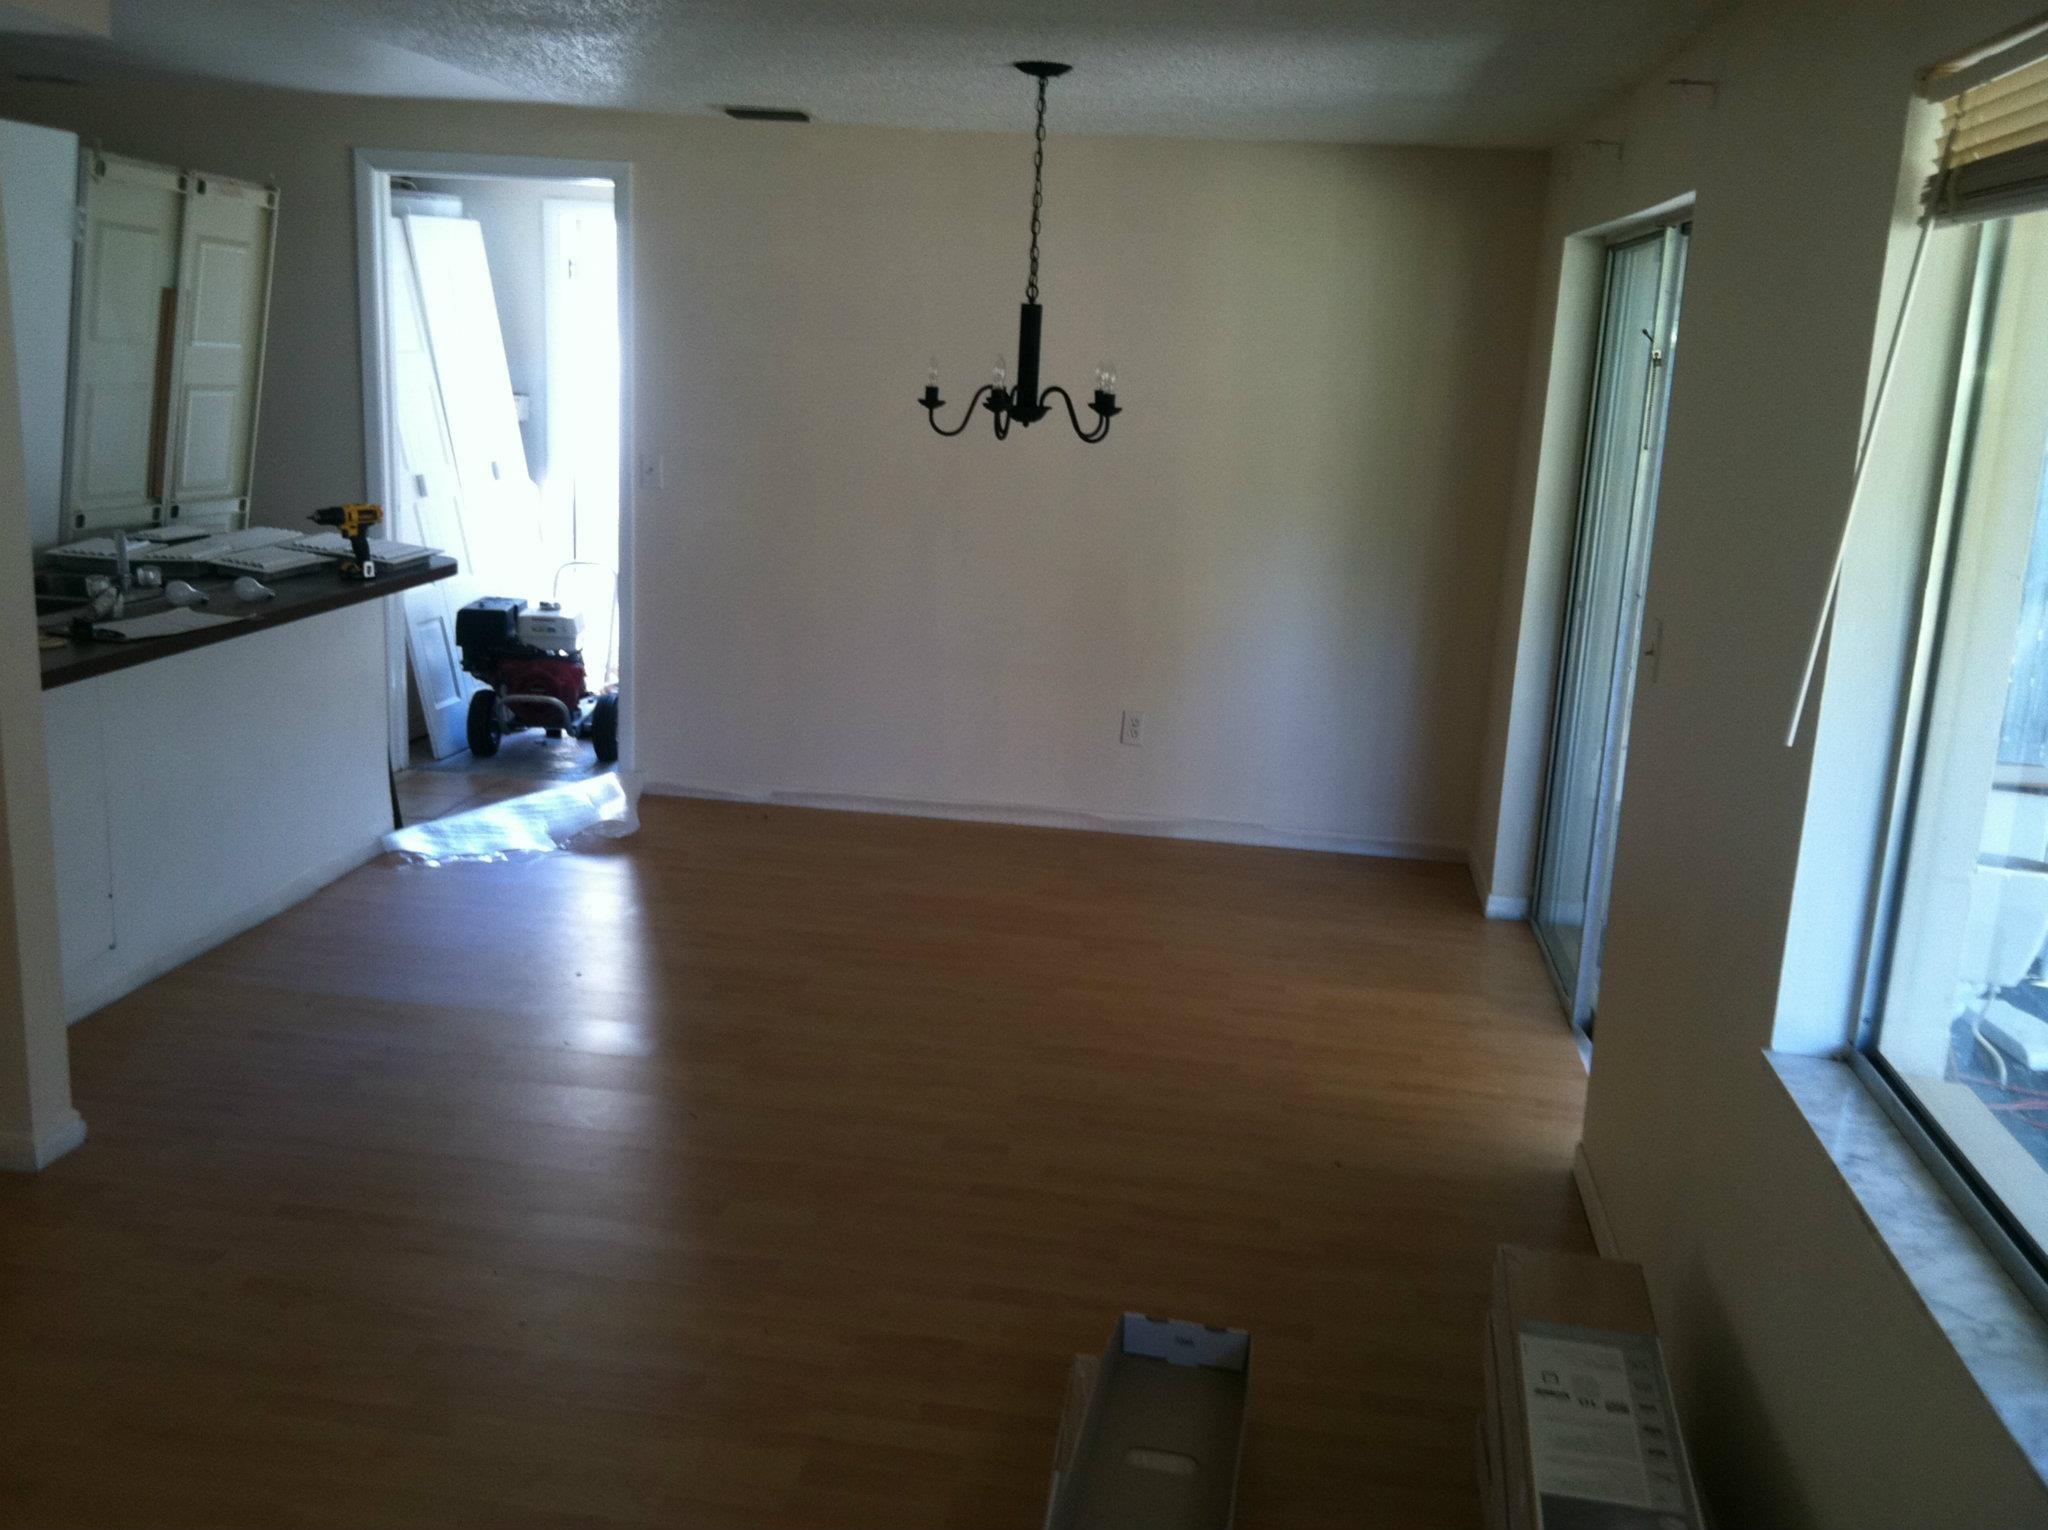 new laminate floors